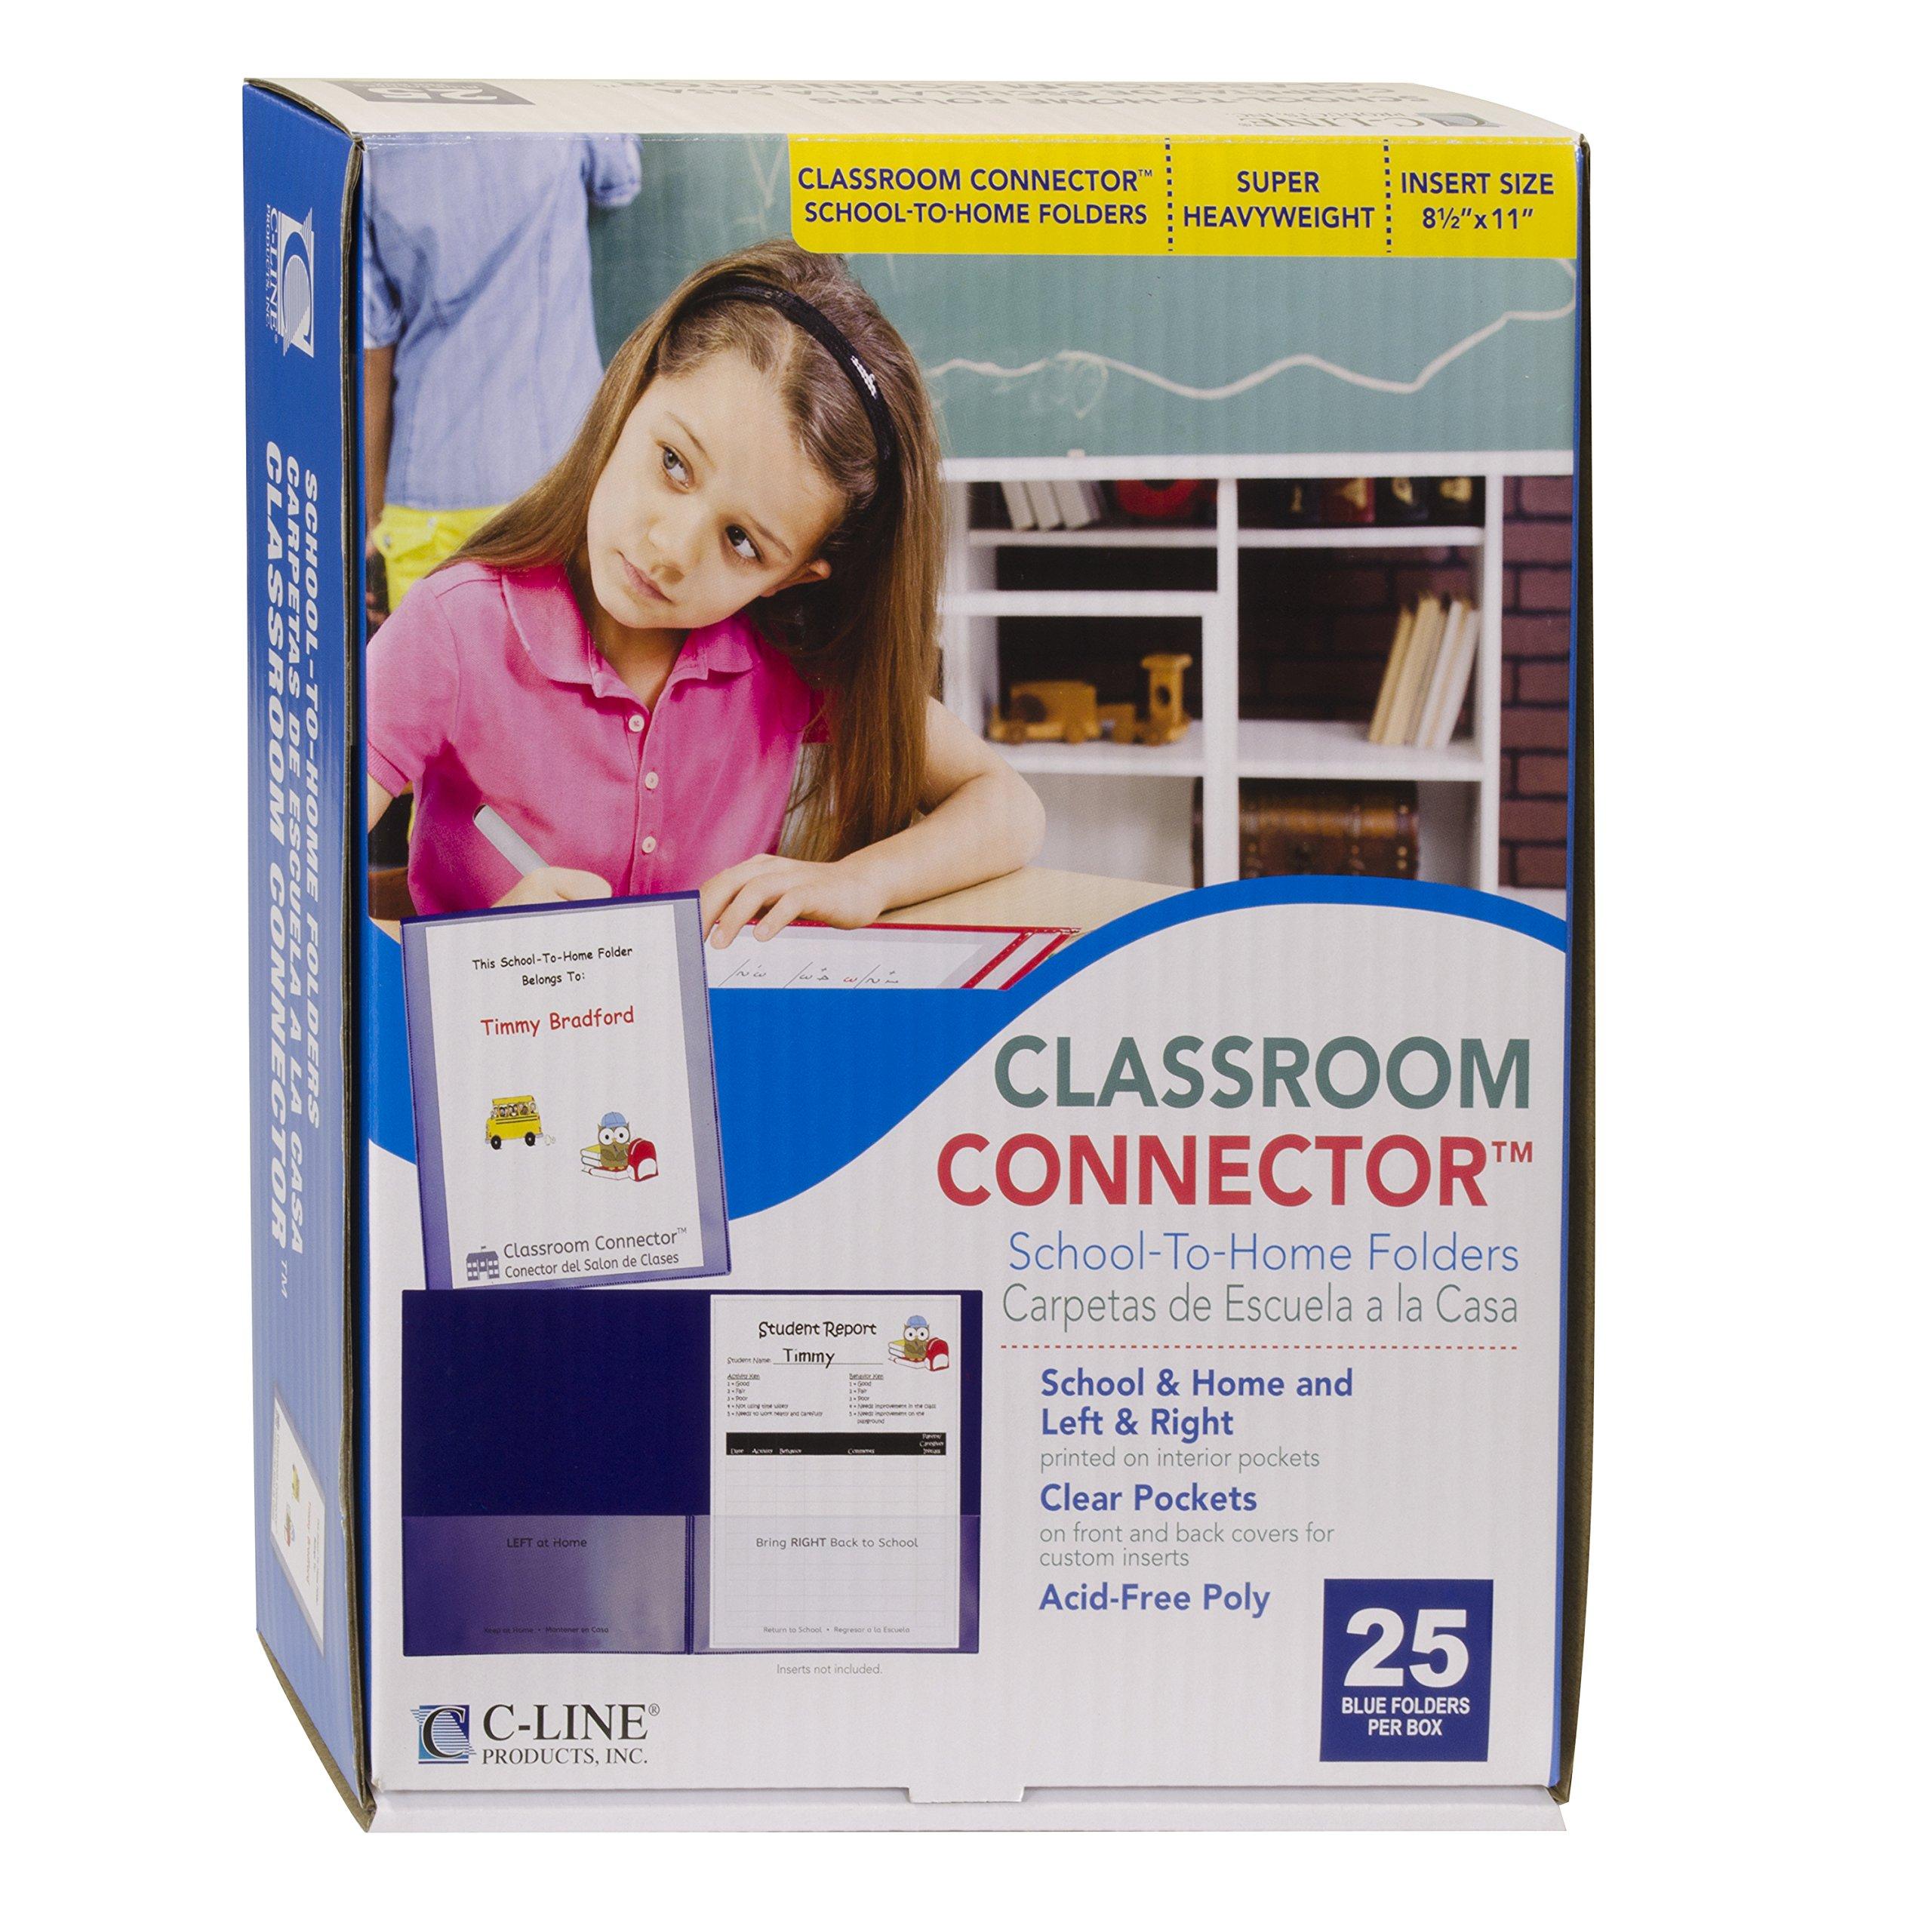 C-Line Classroom Connector School-to-Home Folders, Blue, 25 per Box (32005)